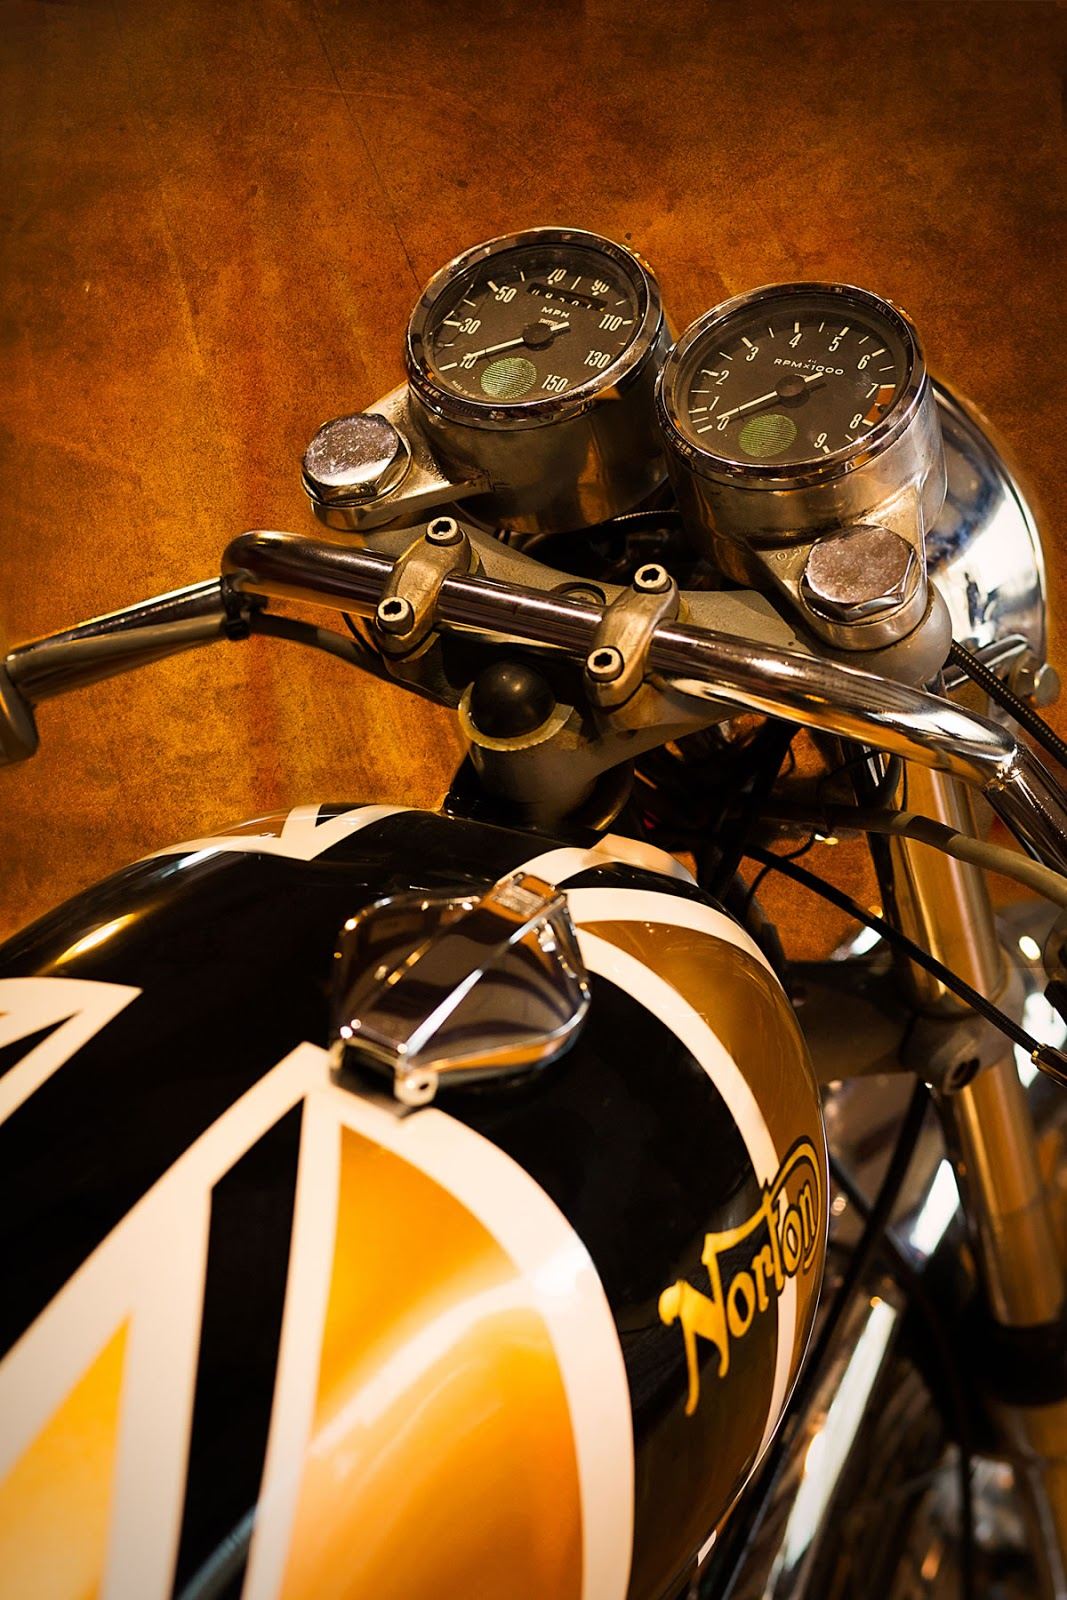 Norton Cafe Racer - Union Jack Gas Tank